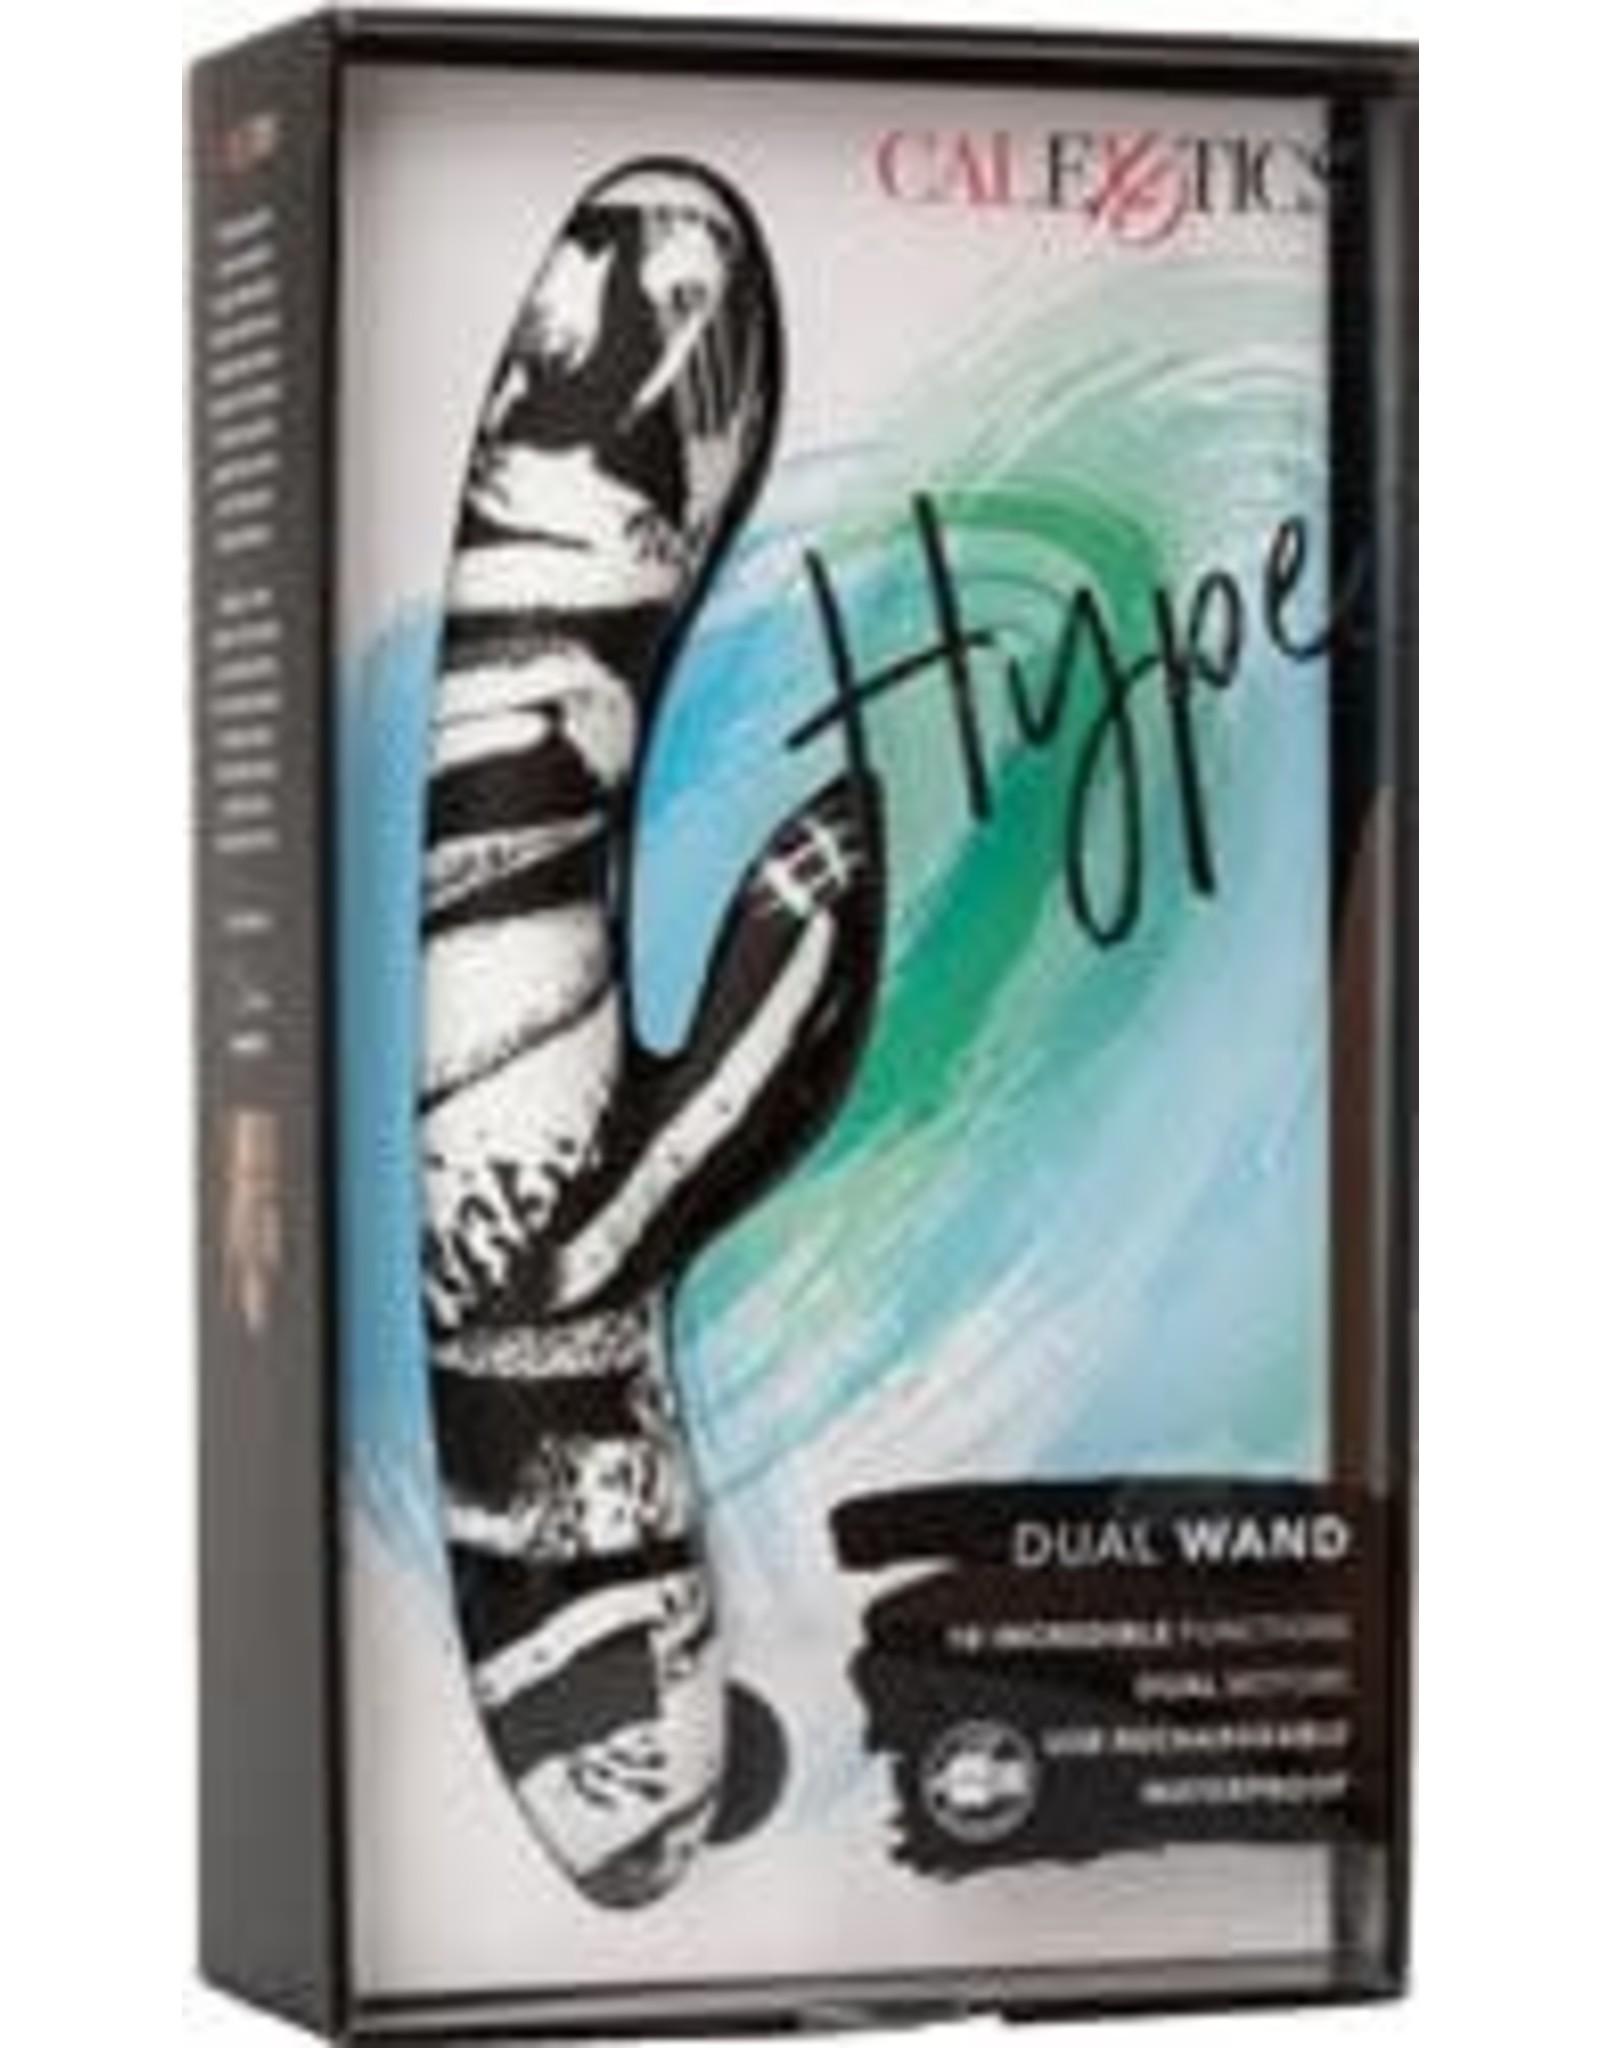 Calexotics Hype Dual Wand